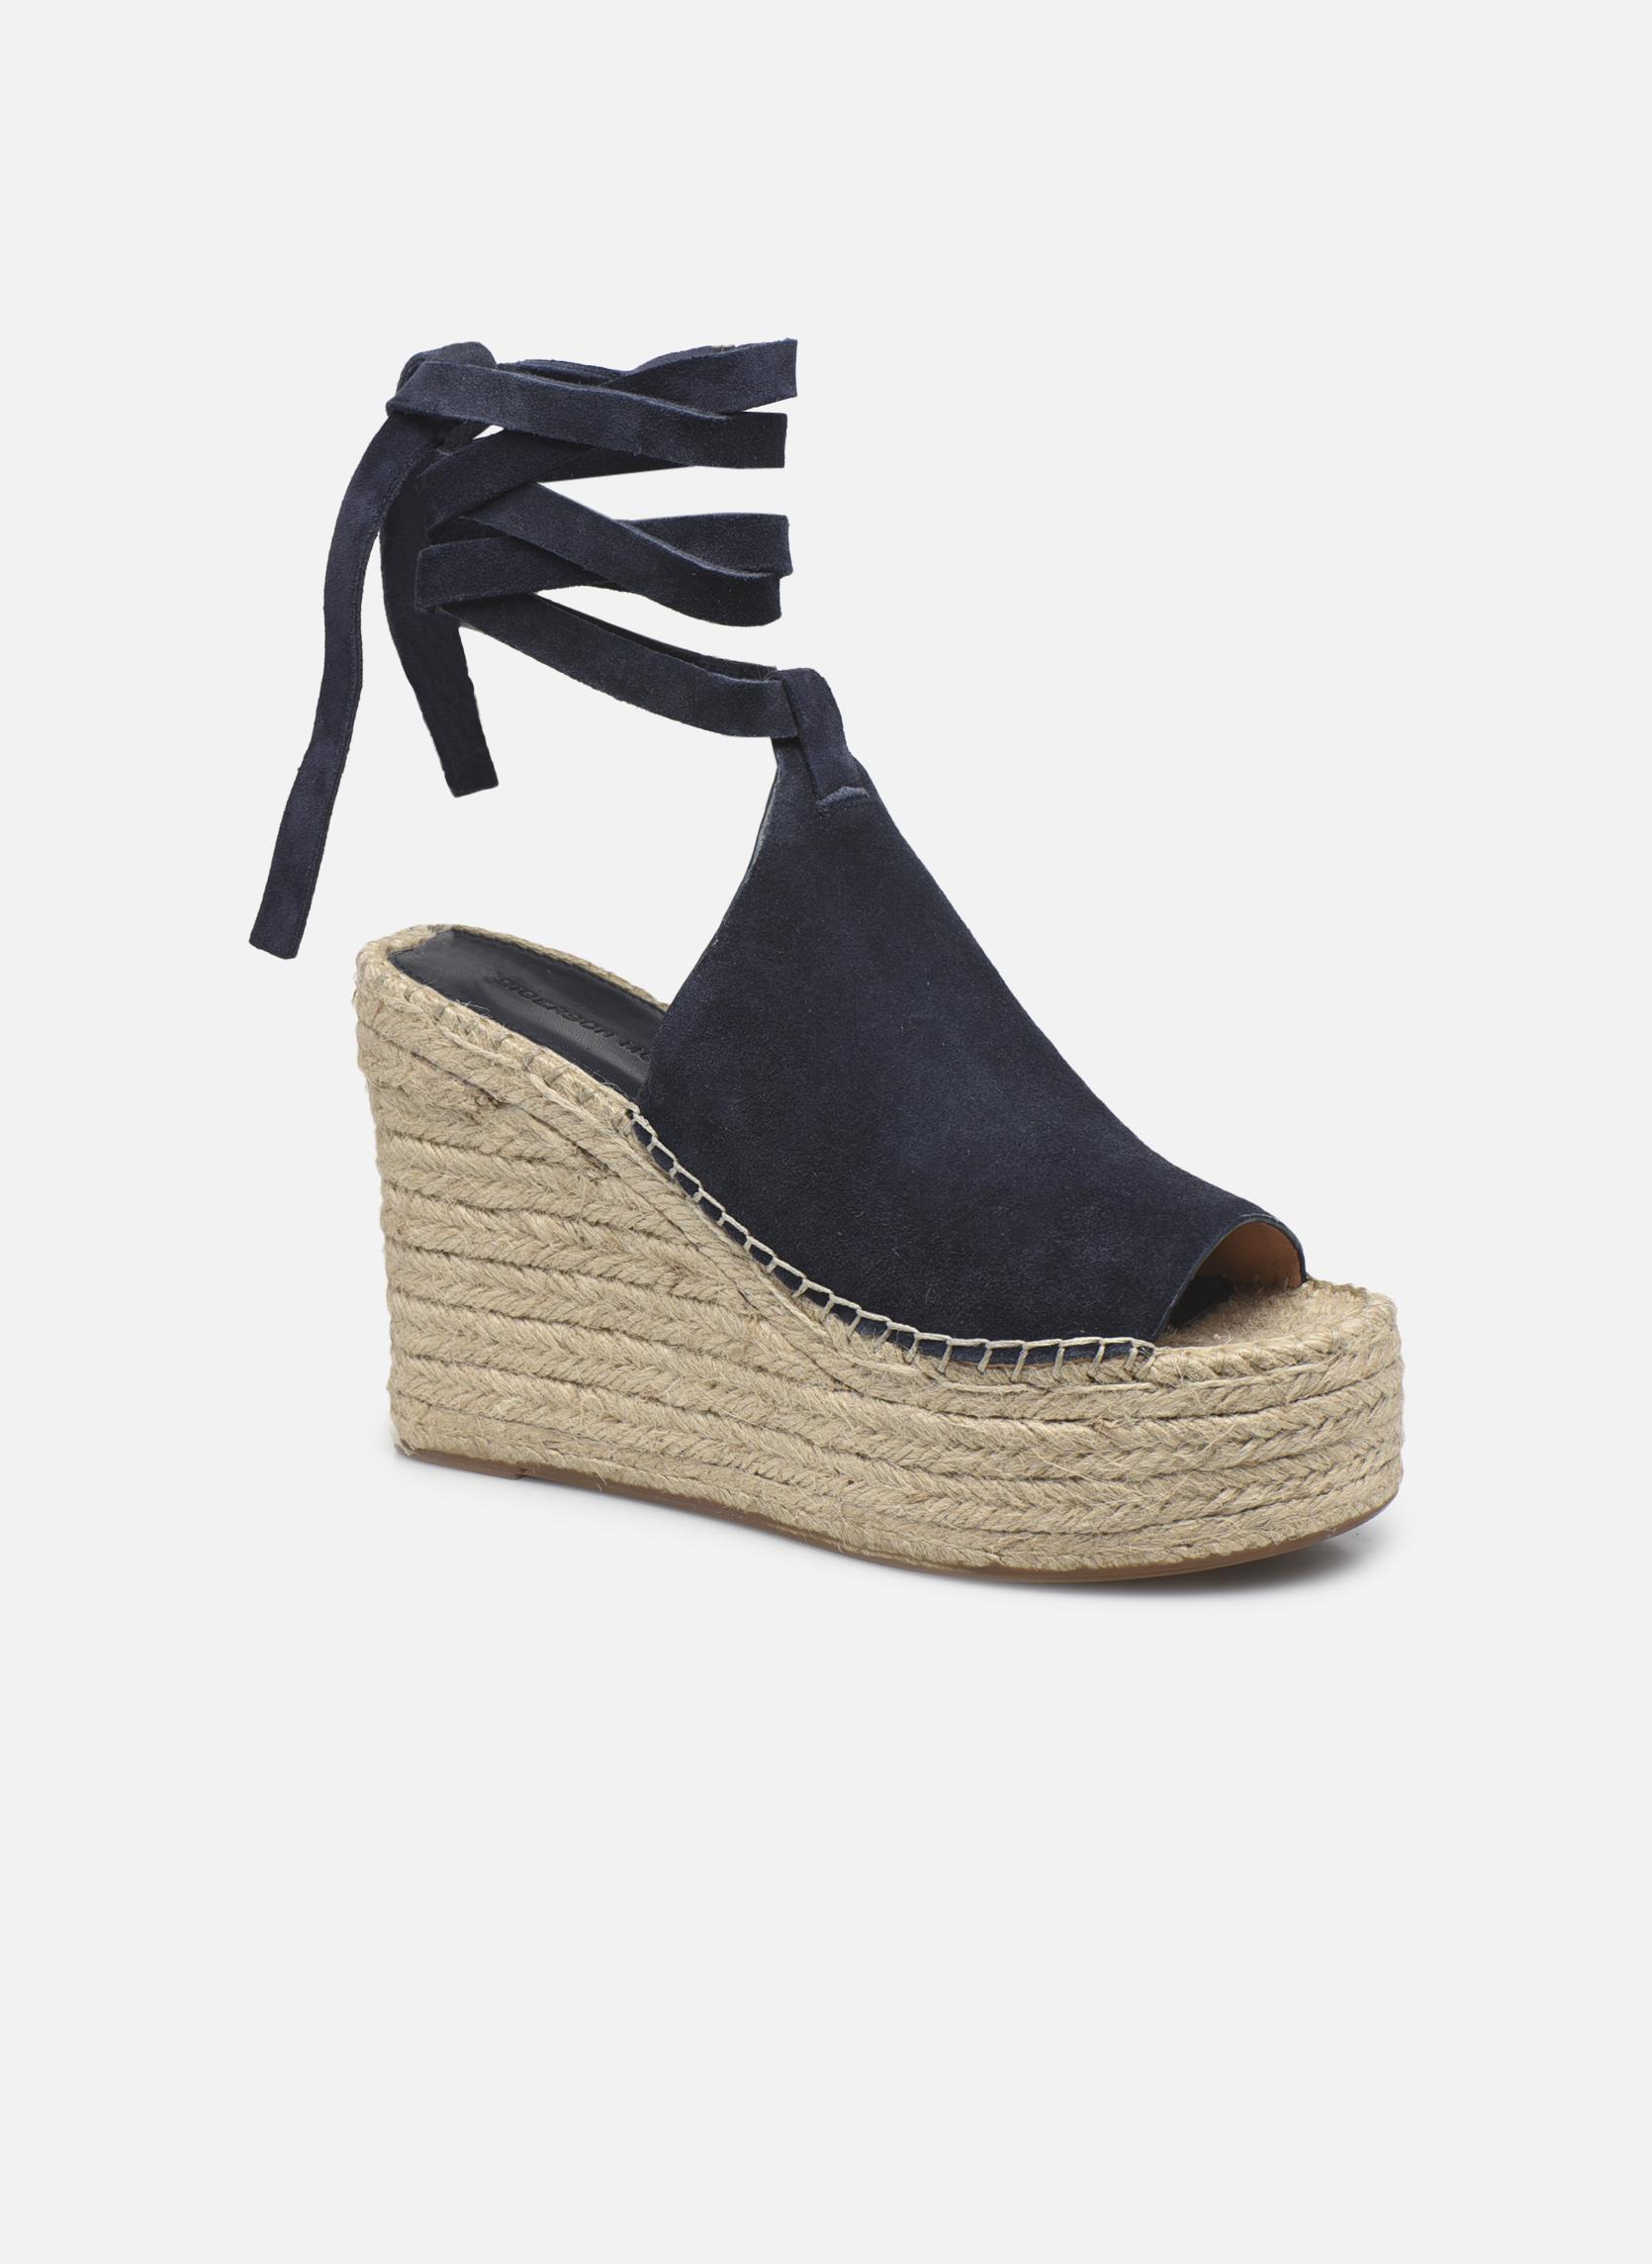 Grandes descuentos últimos zapatos Sigerson Morrison AUDORA (Azul) - Alpargatas Descuento